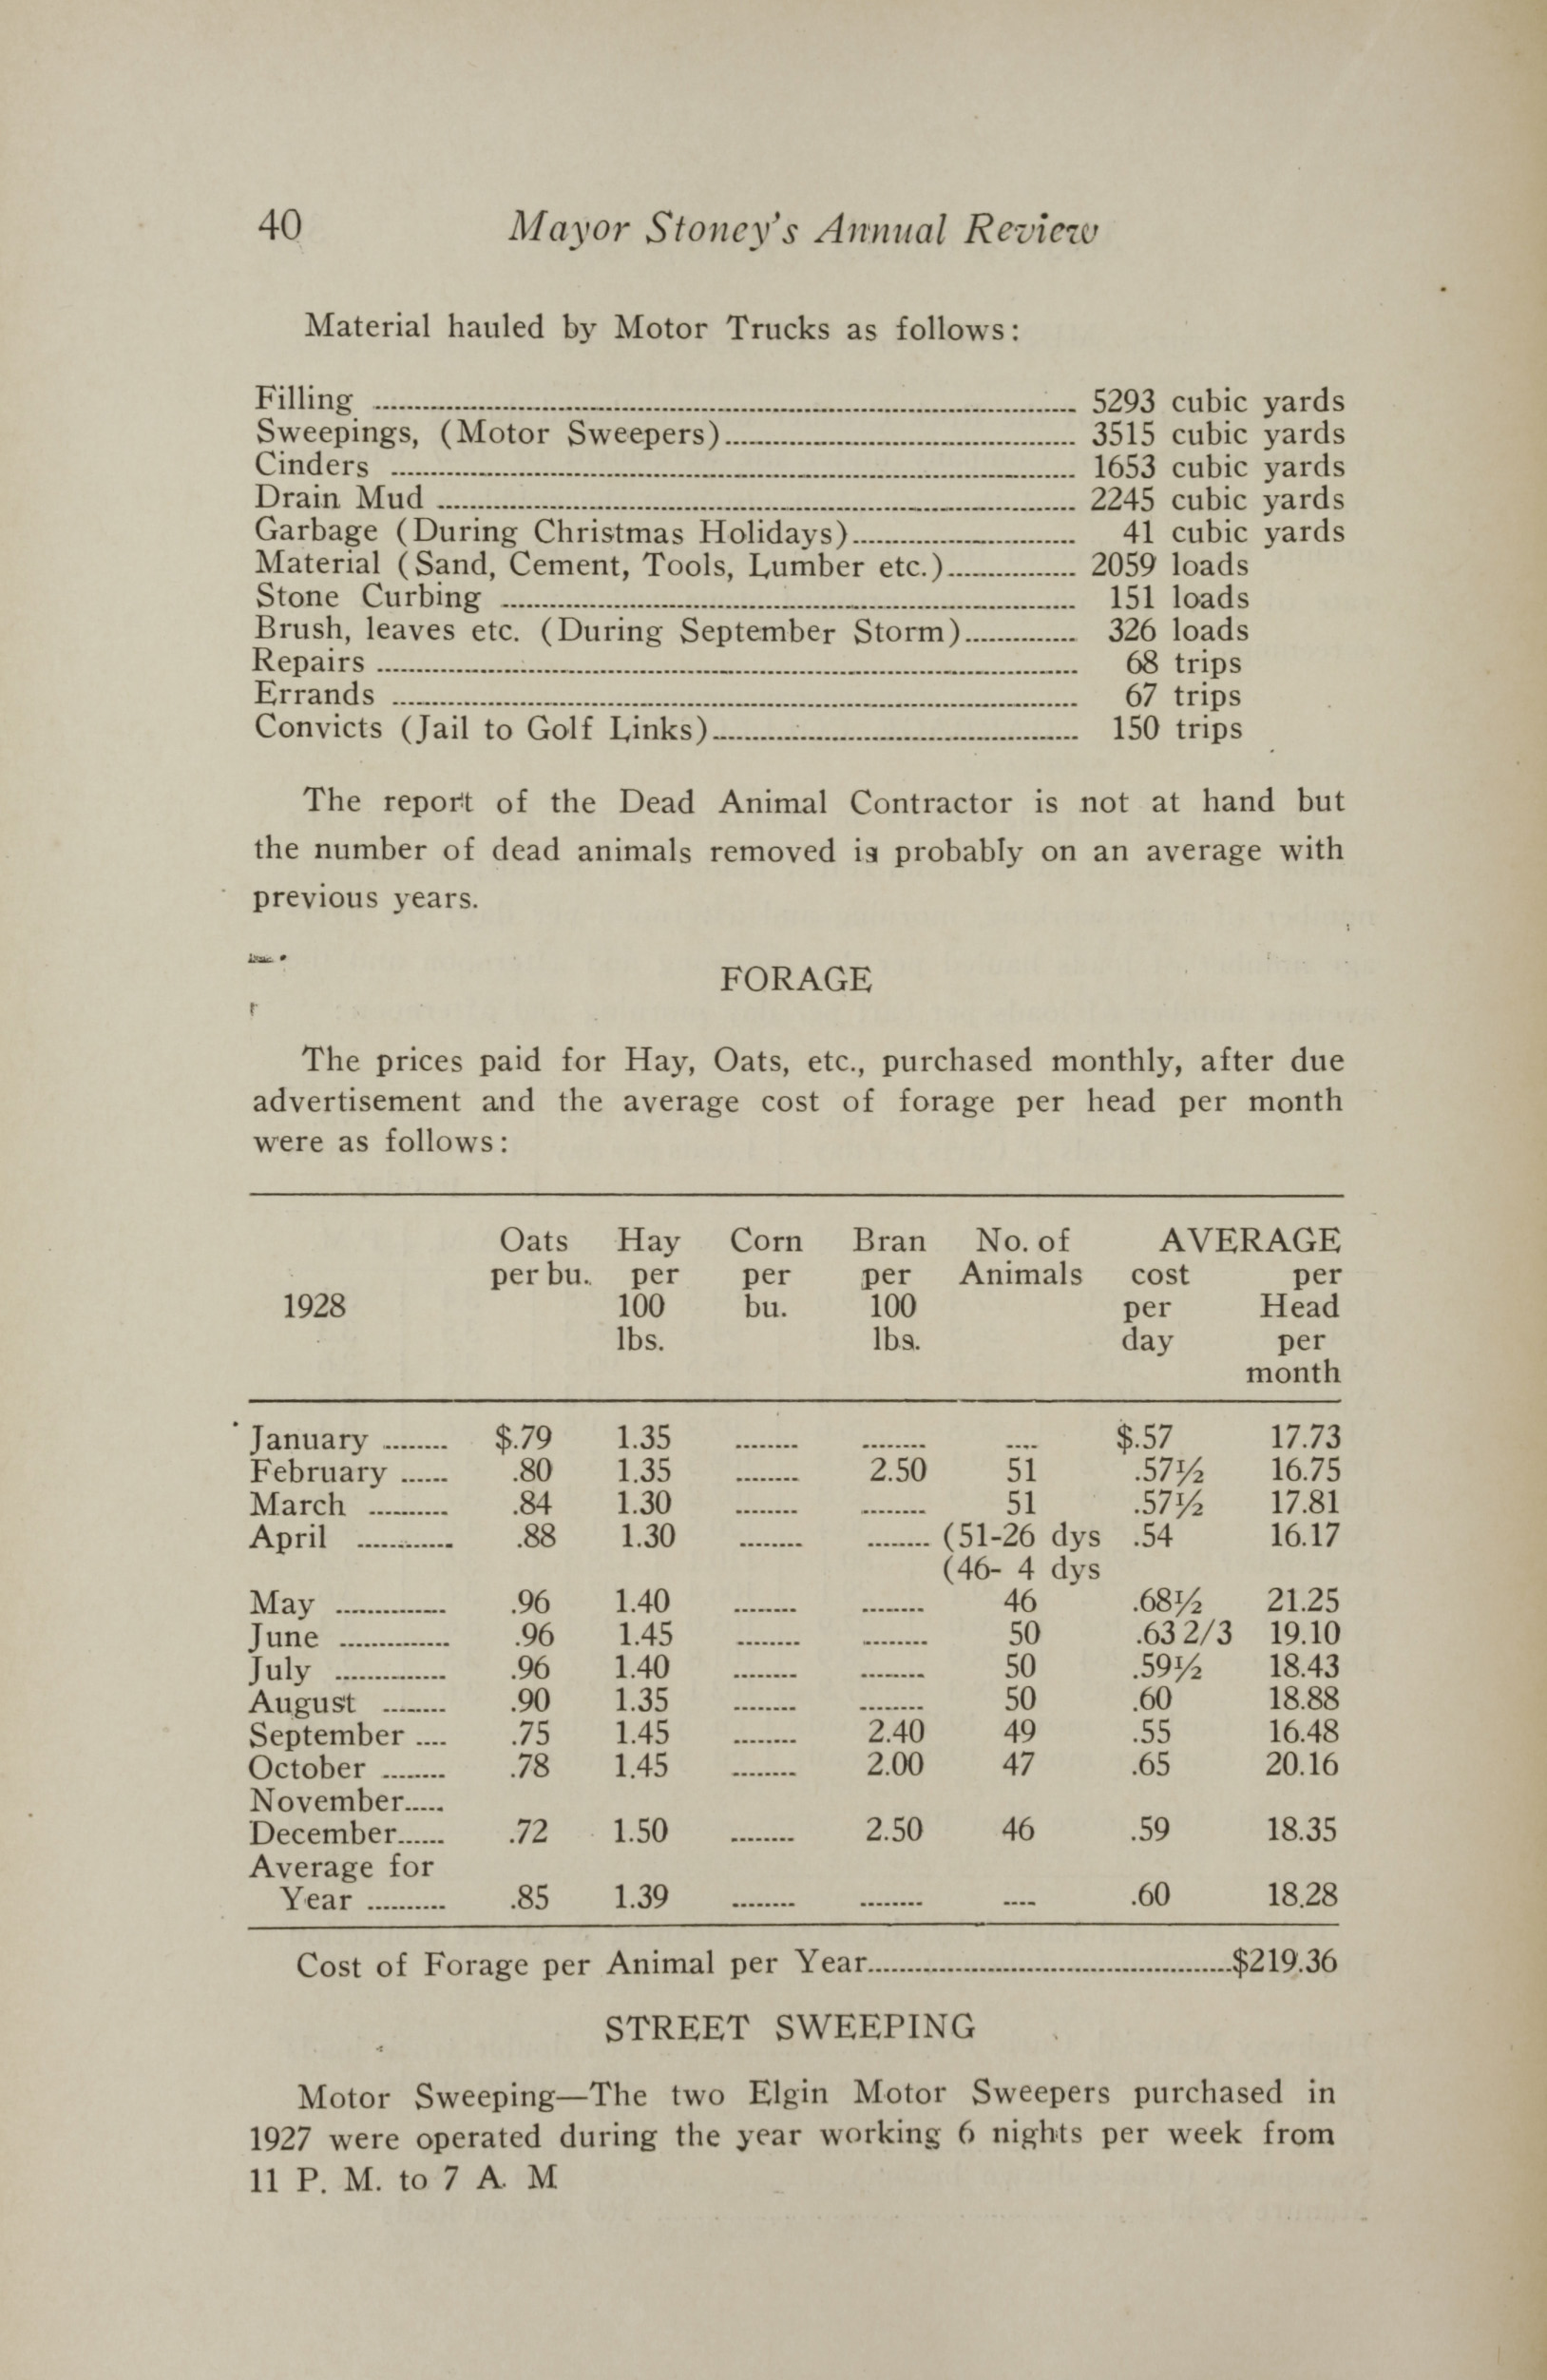 Charleston Yearbook, 1928, page 40